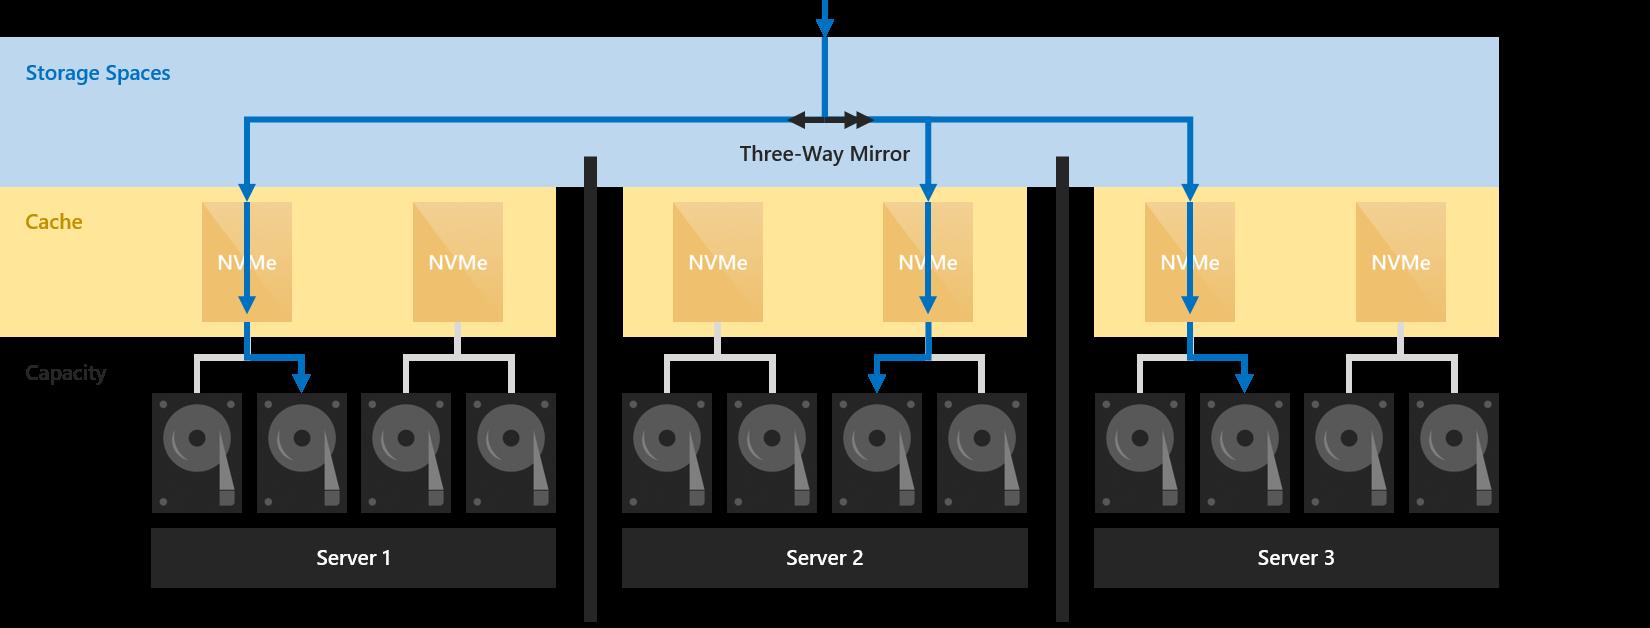 W2k16 ssd cache server side architecture